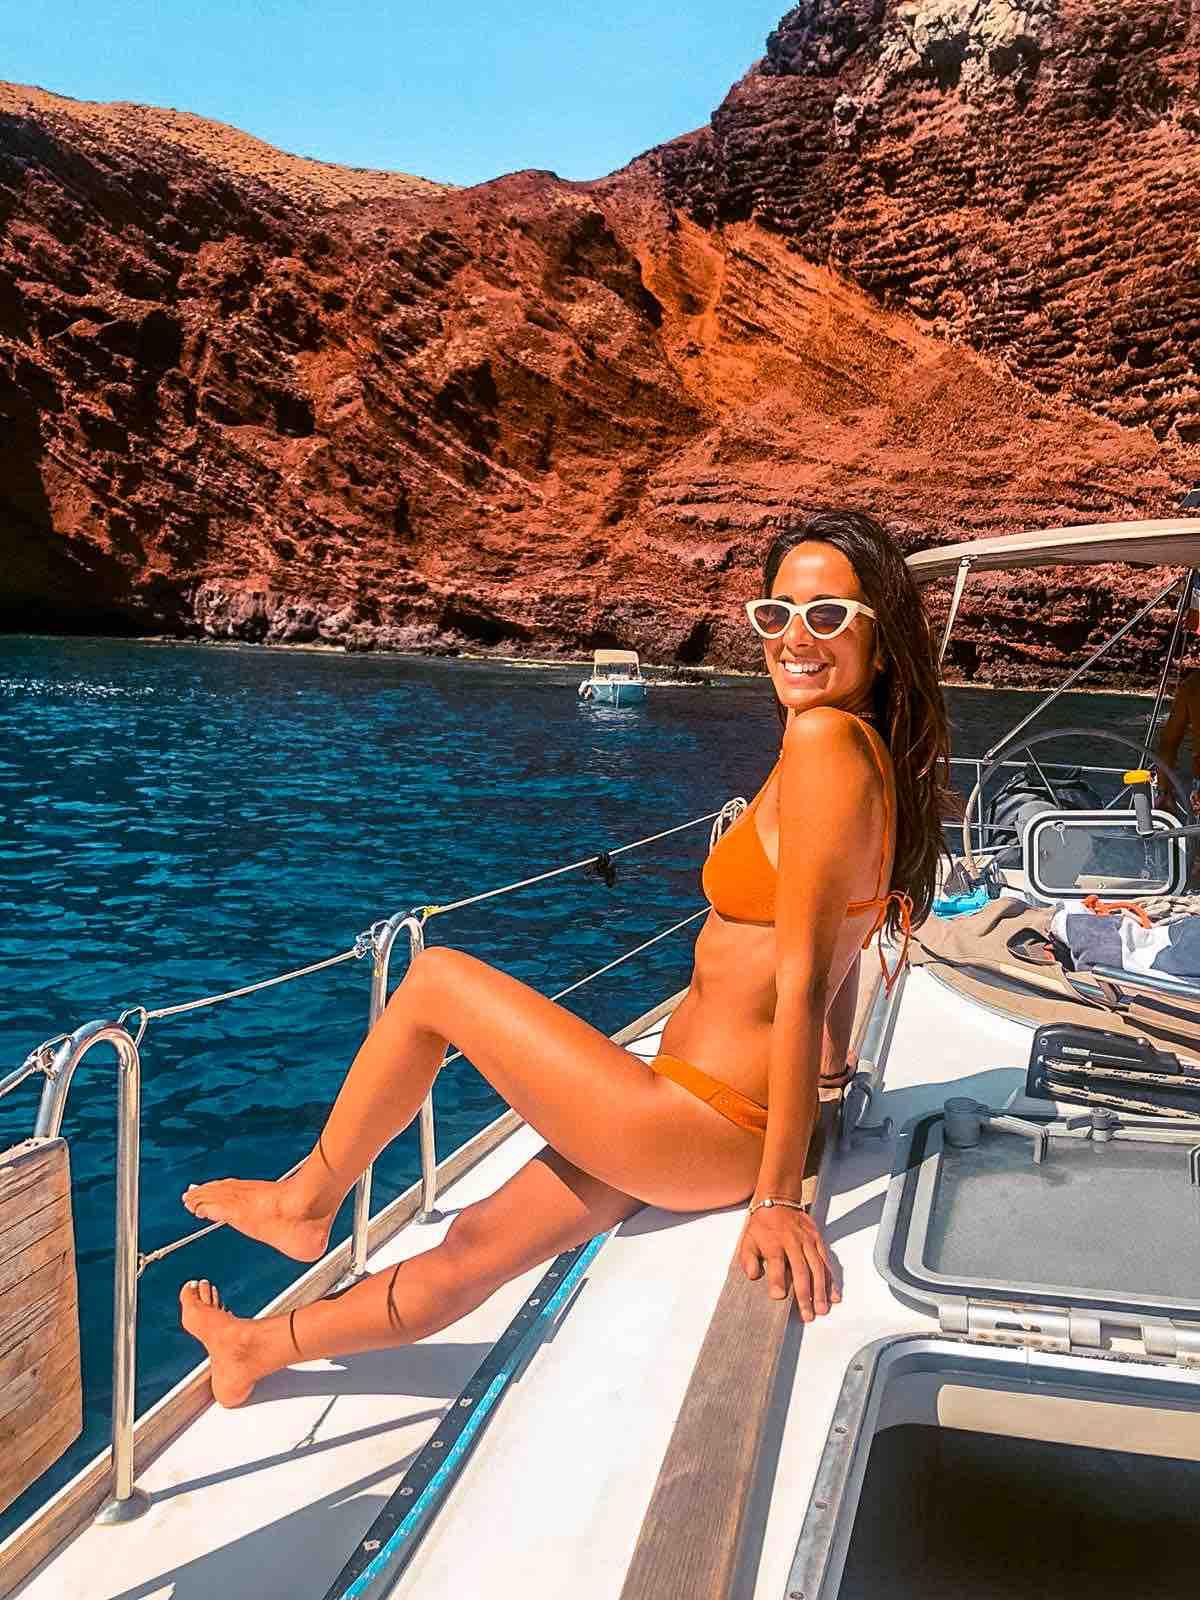 Capraia Cala rossa Isola di Capraia Arcipelago toscano Toscana Italia Passione Passaporto